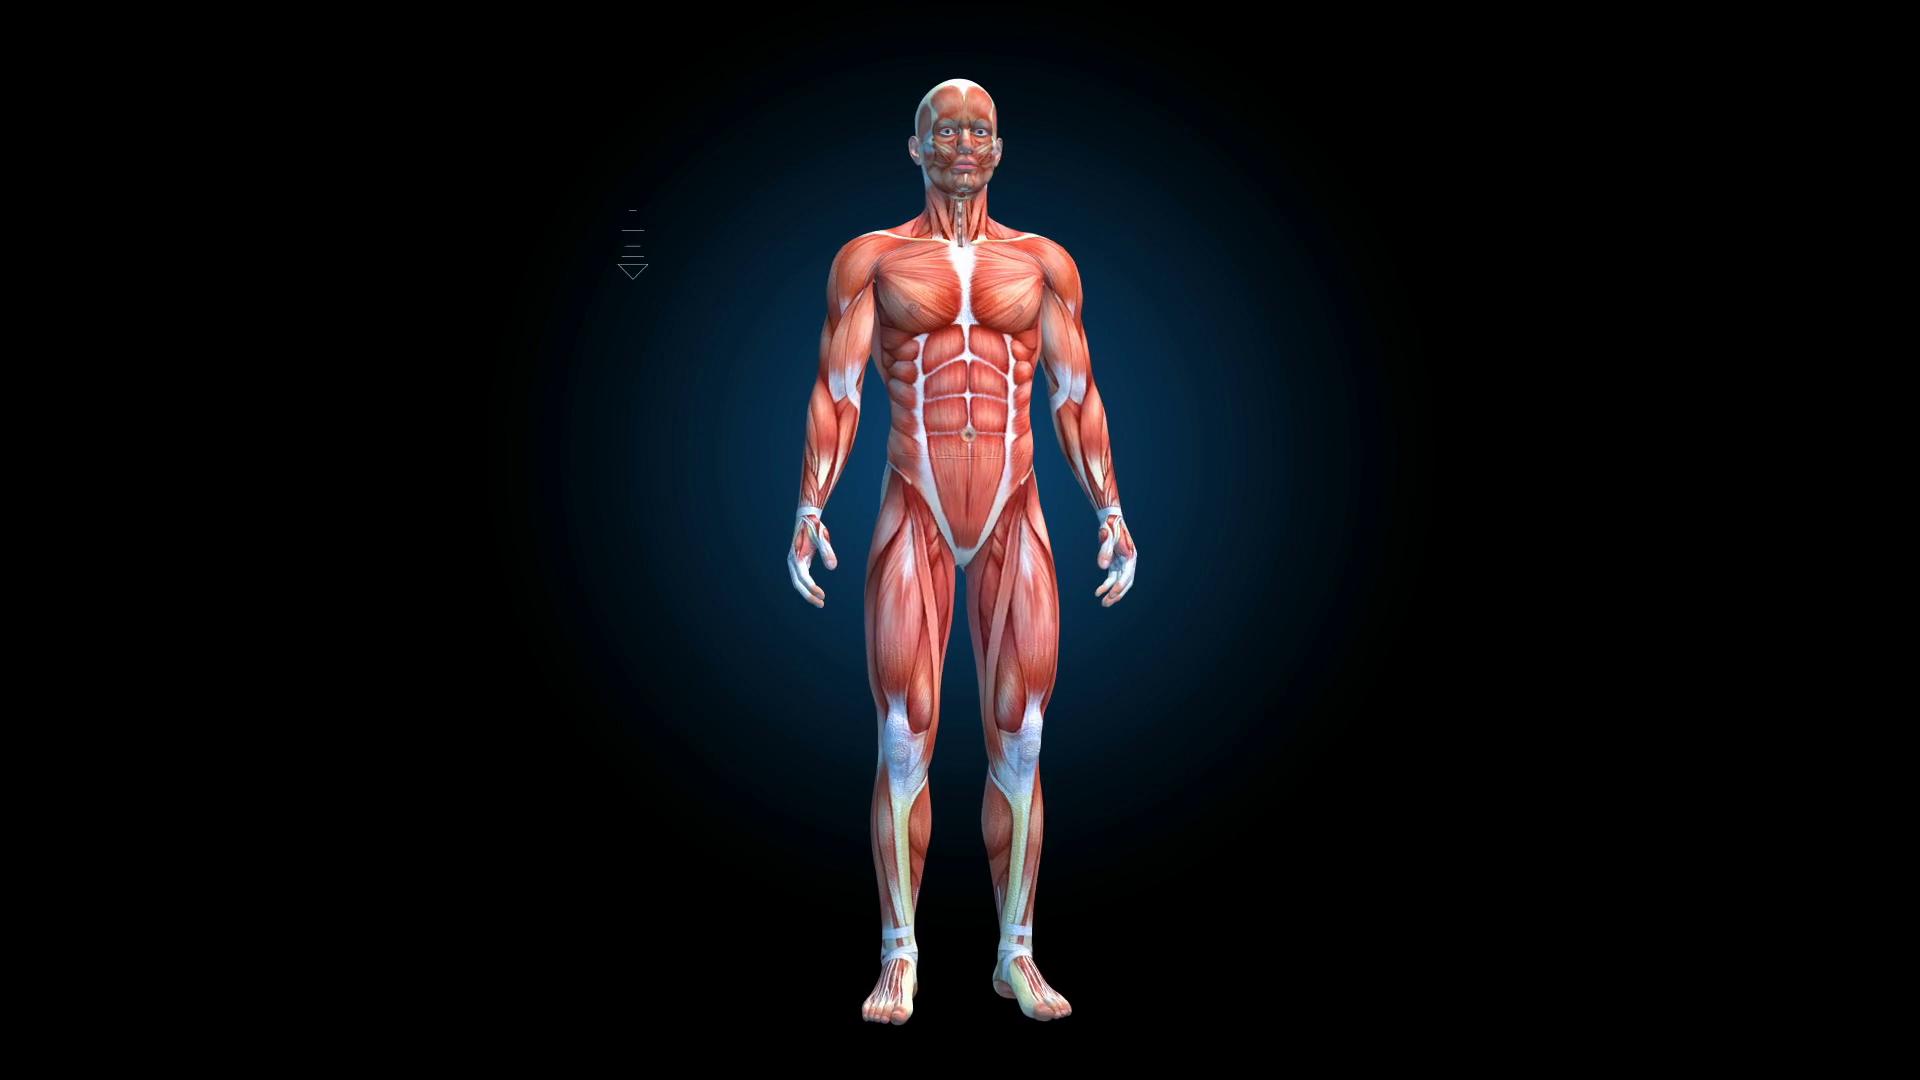 Base Male Anatomy 3d model - CGStudio